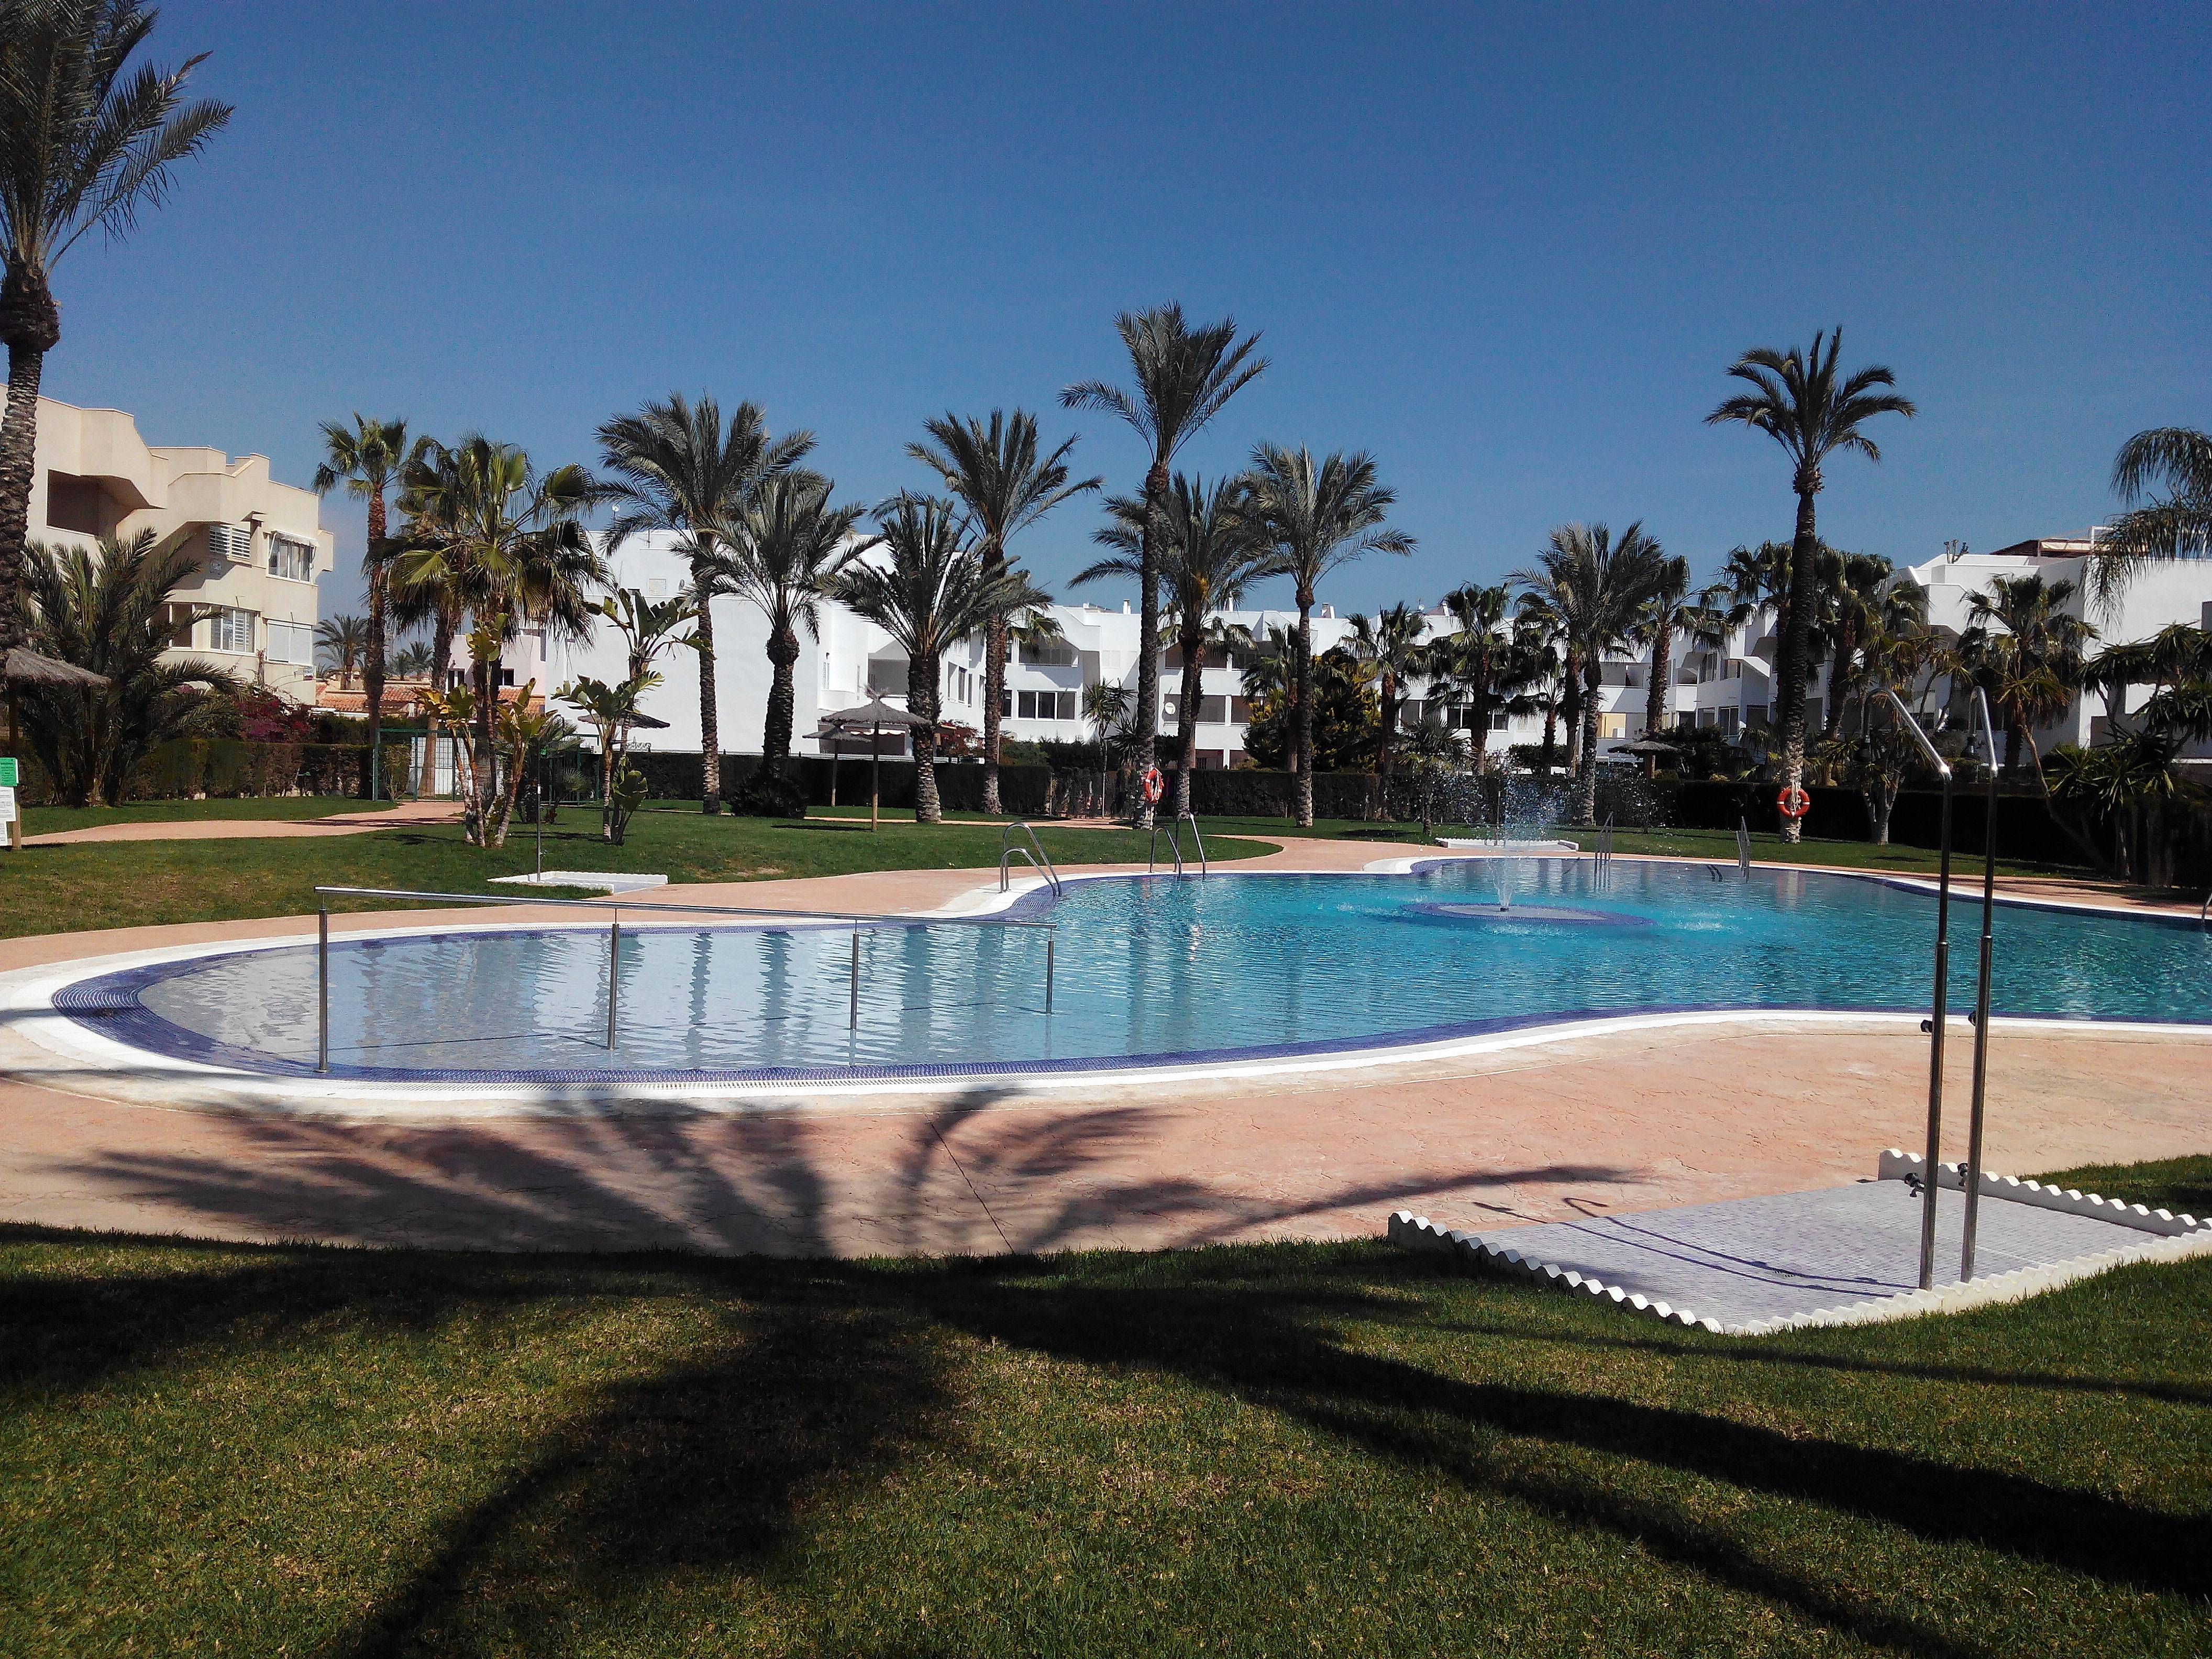 esta noche charla flaco cerca de Almería